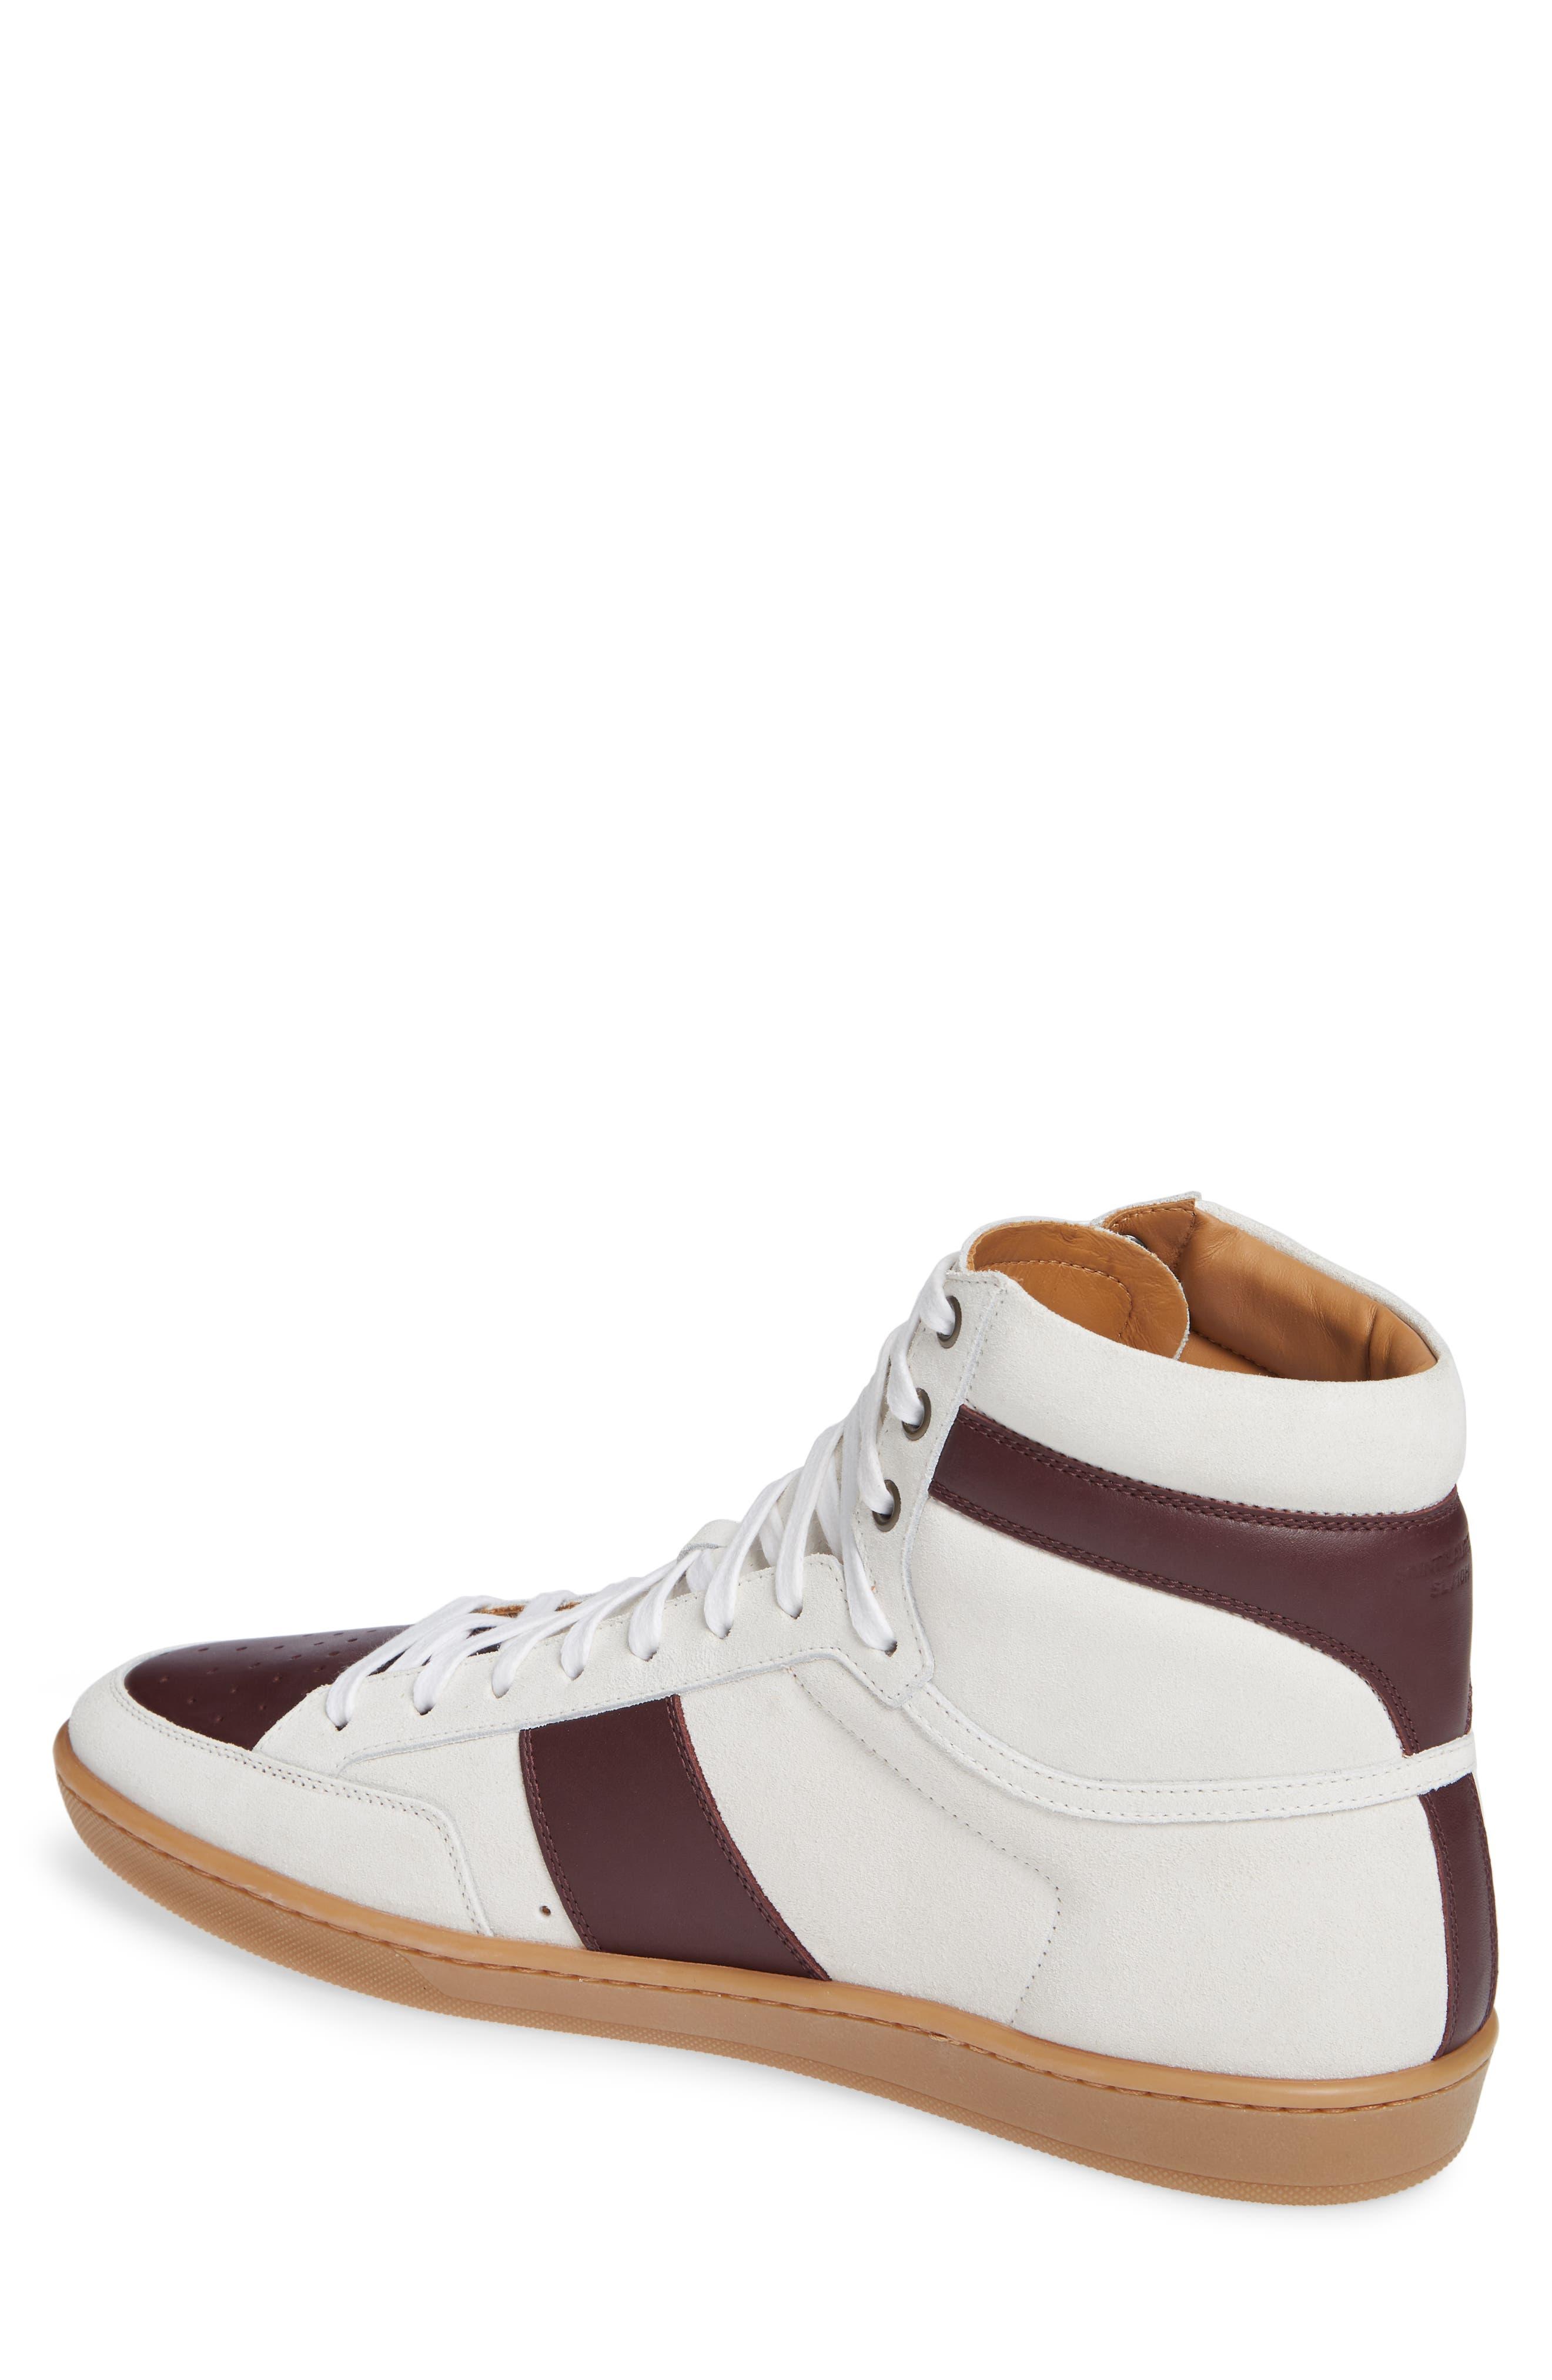 SL/10H Signature Court Classic High-Top Sneaker,                             Alternate thumbnail 2, color,                             Milk/ Barolo